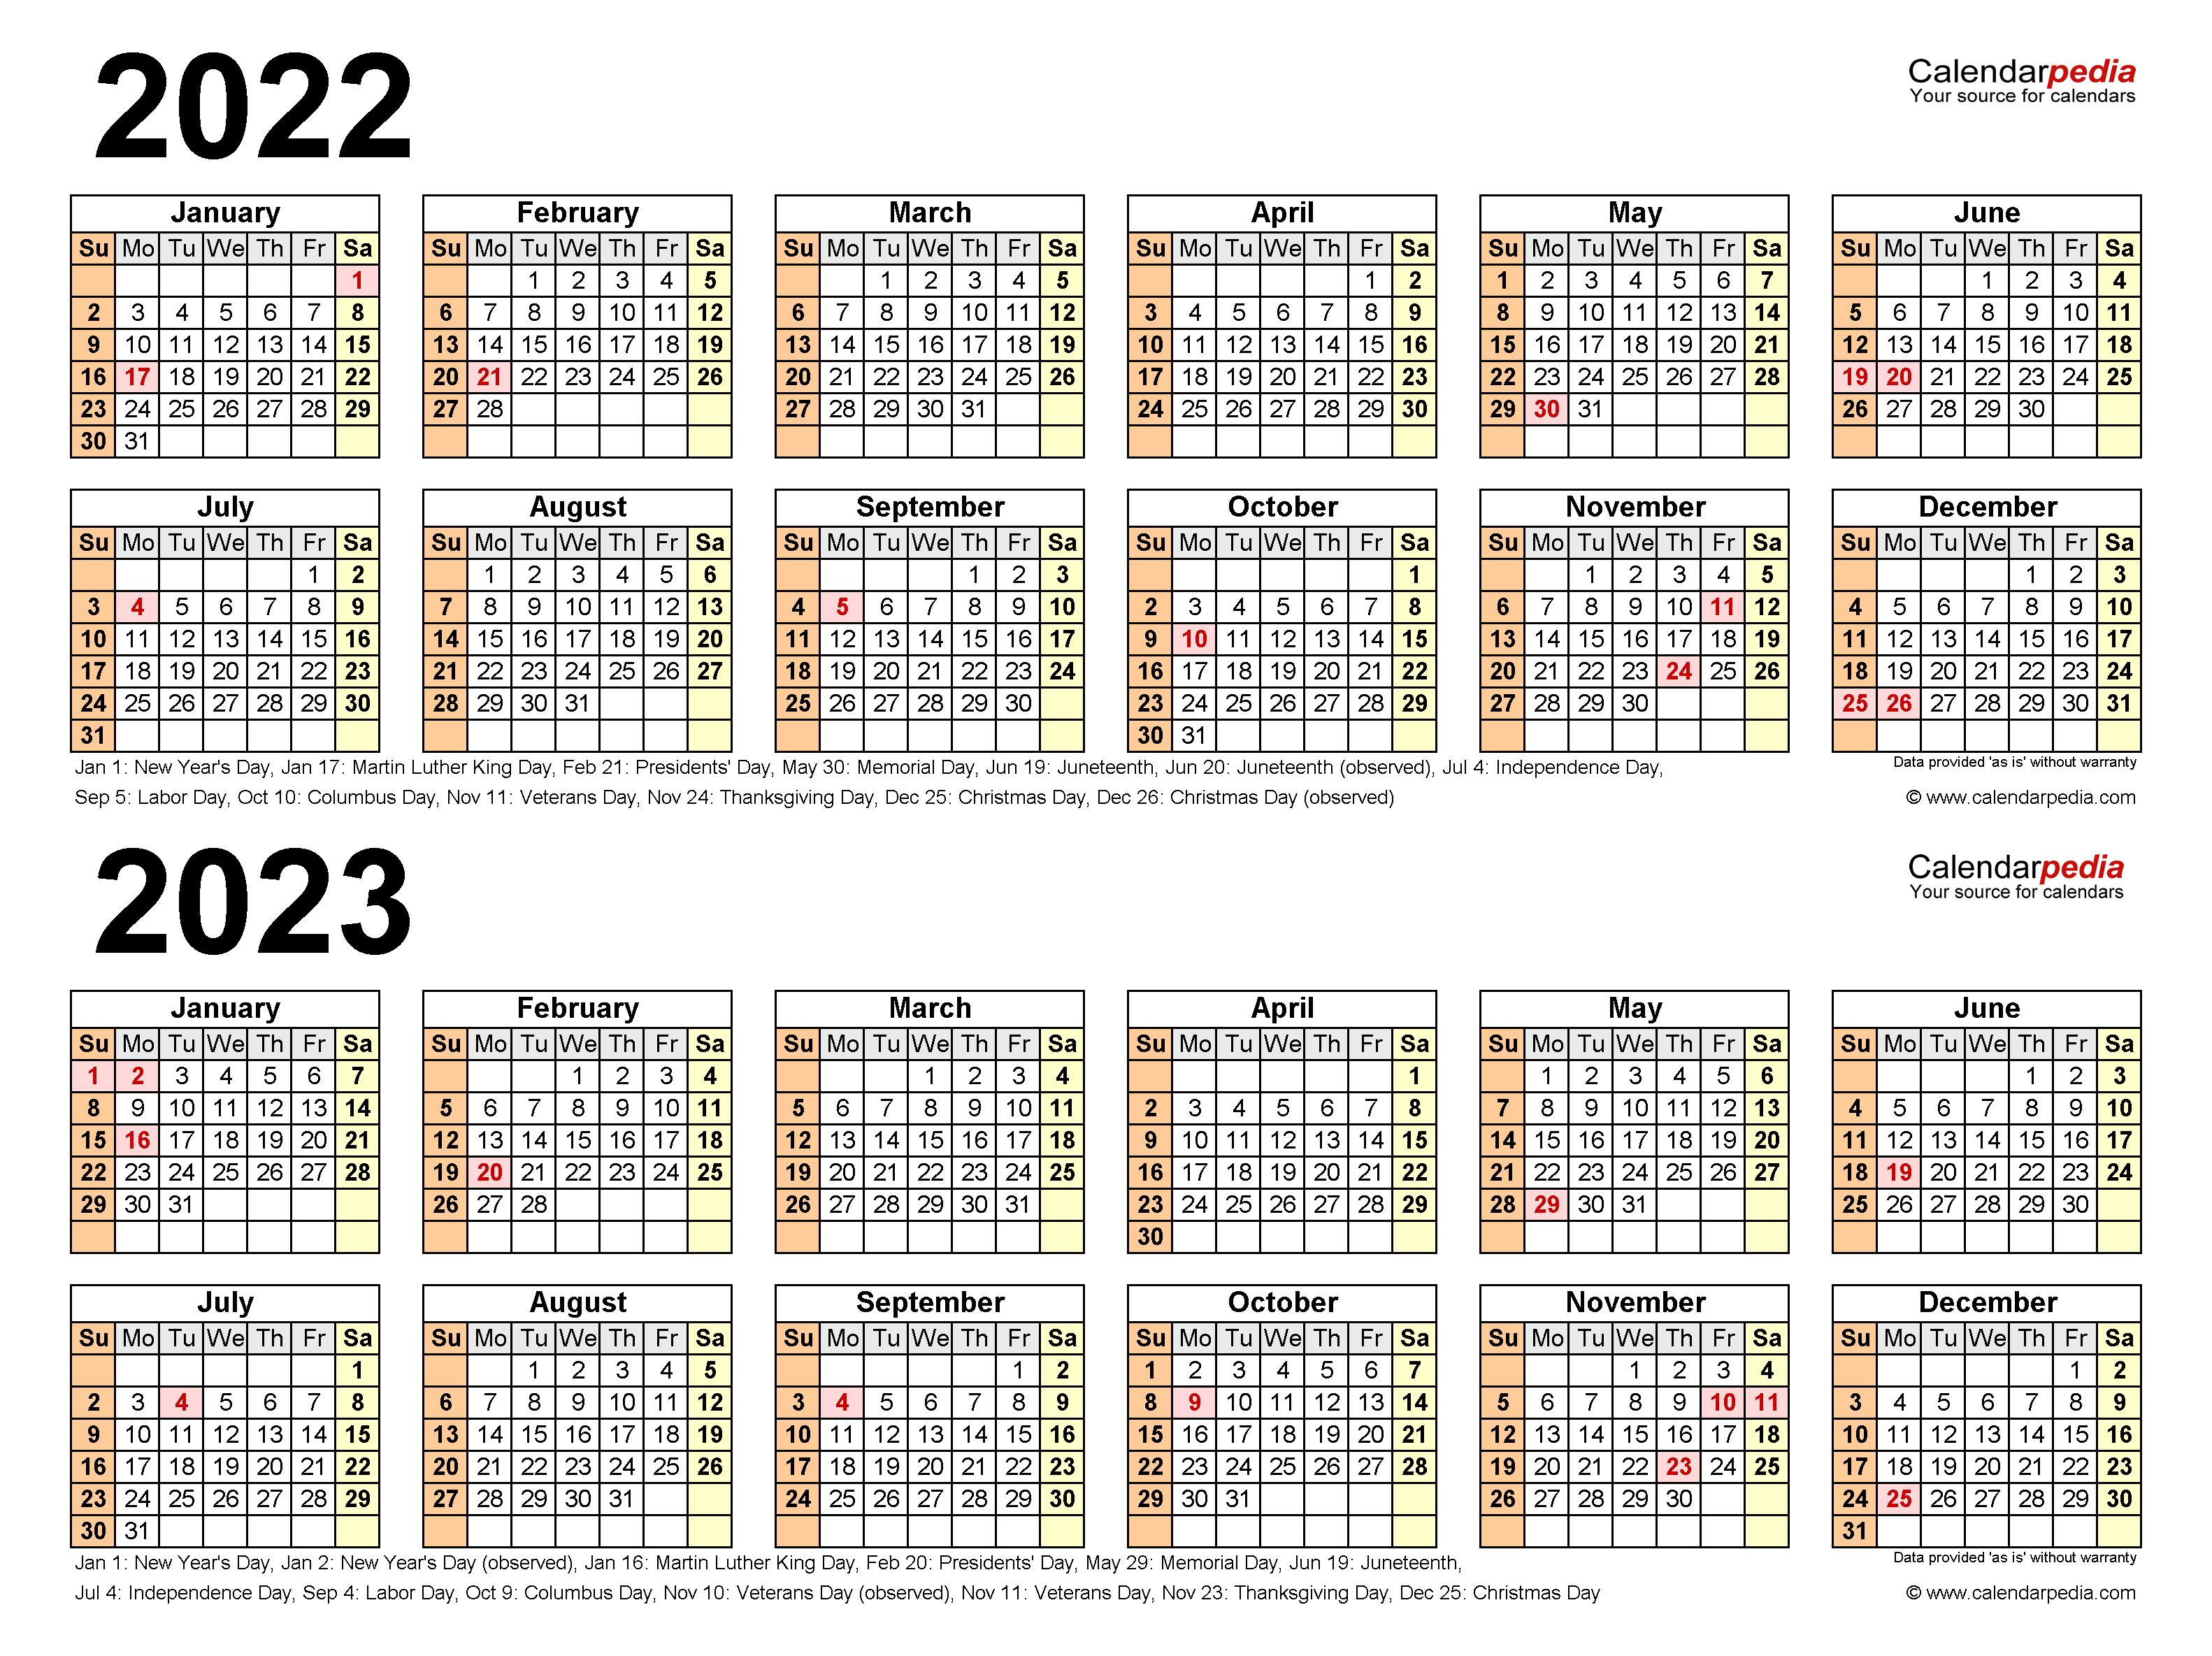 Purdue Calendar 2022 2023.2022 2023 Two Year Calendar Free Printable Pdf Templates